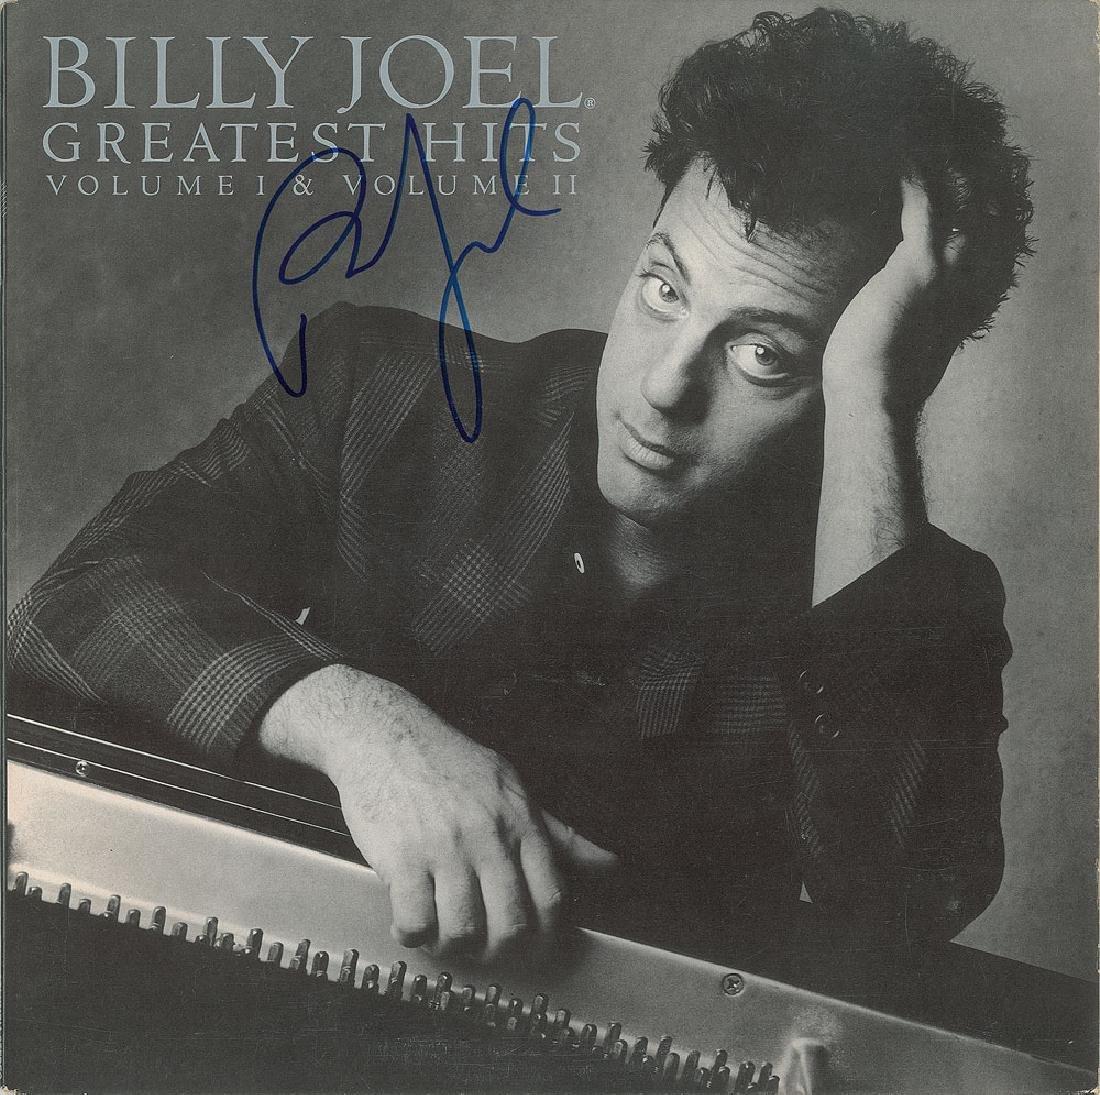 Billy Joel Signed Album